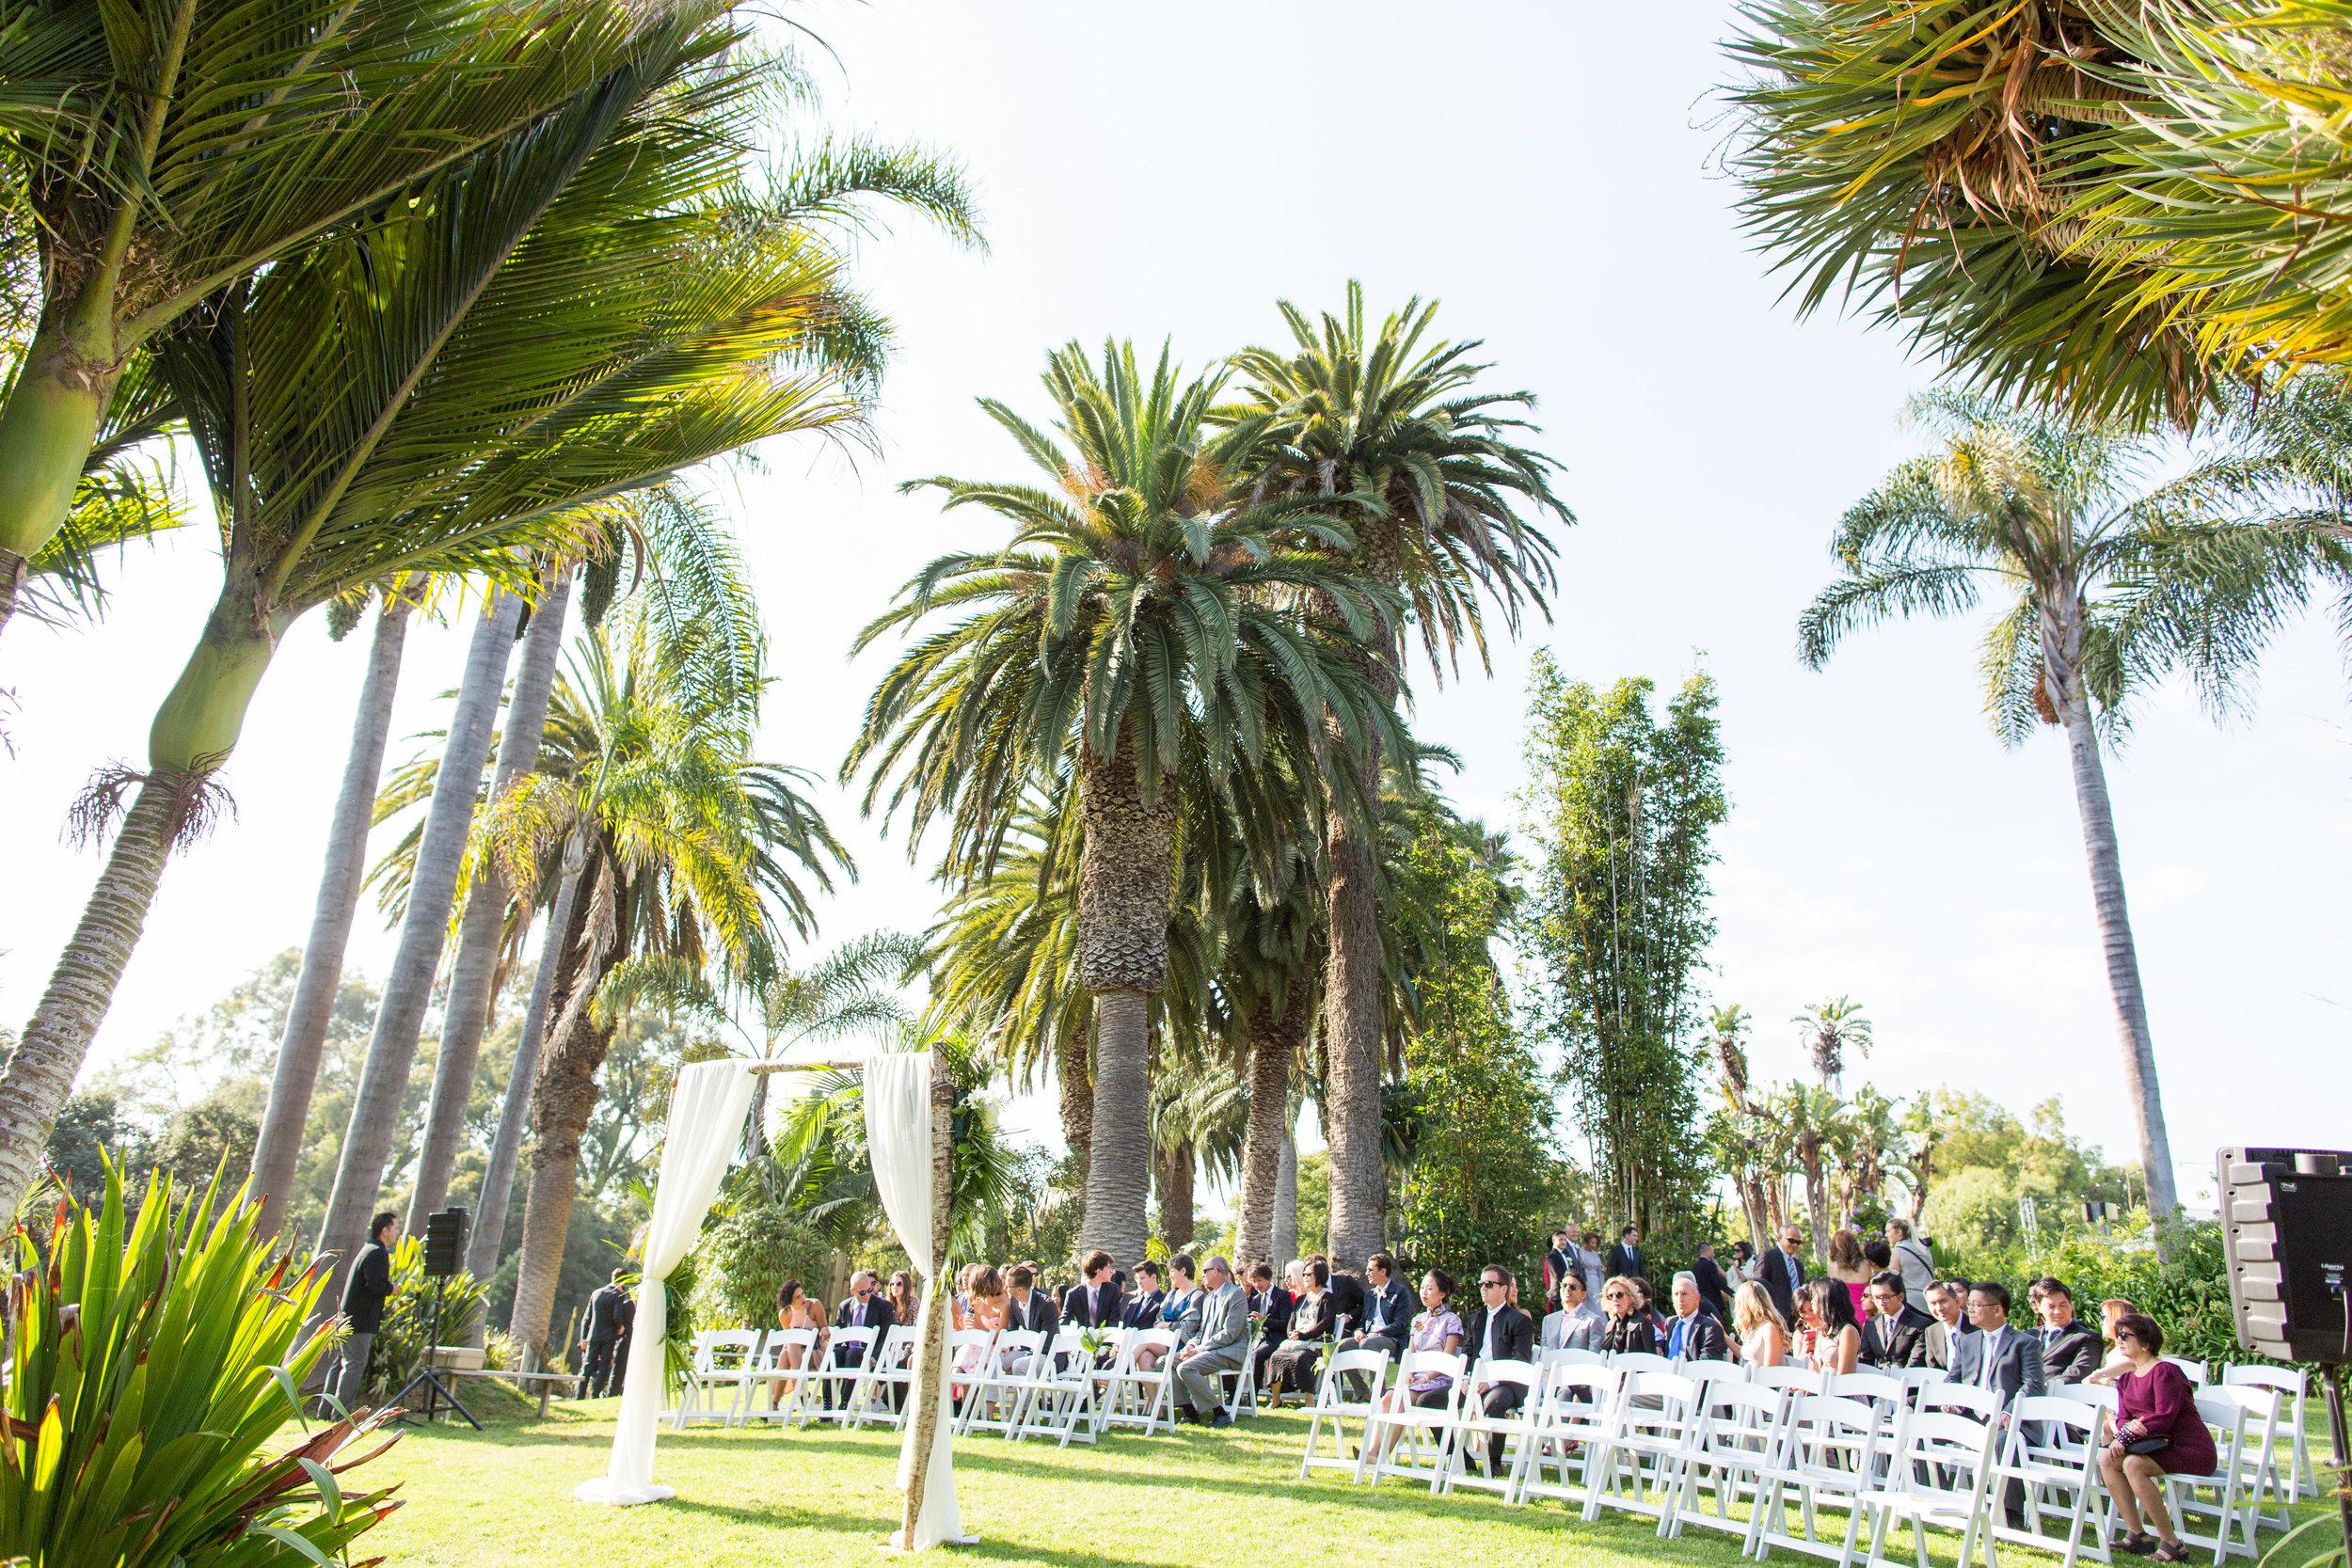 www.santabarbarawedding.com   Santa Barbara Zoo   Wonder Tribe   Events by Rincon   Ceremony